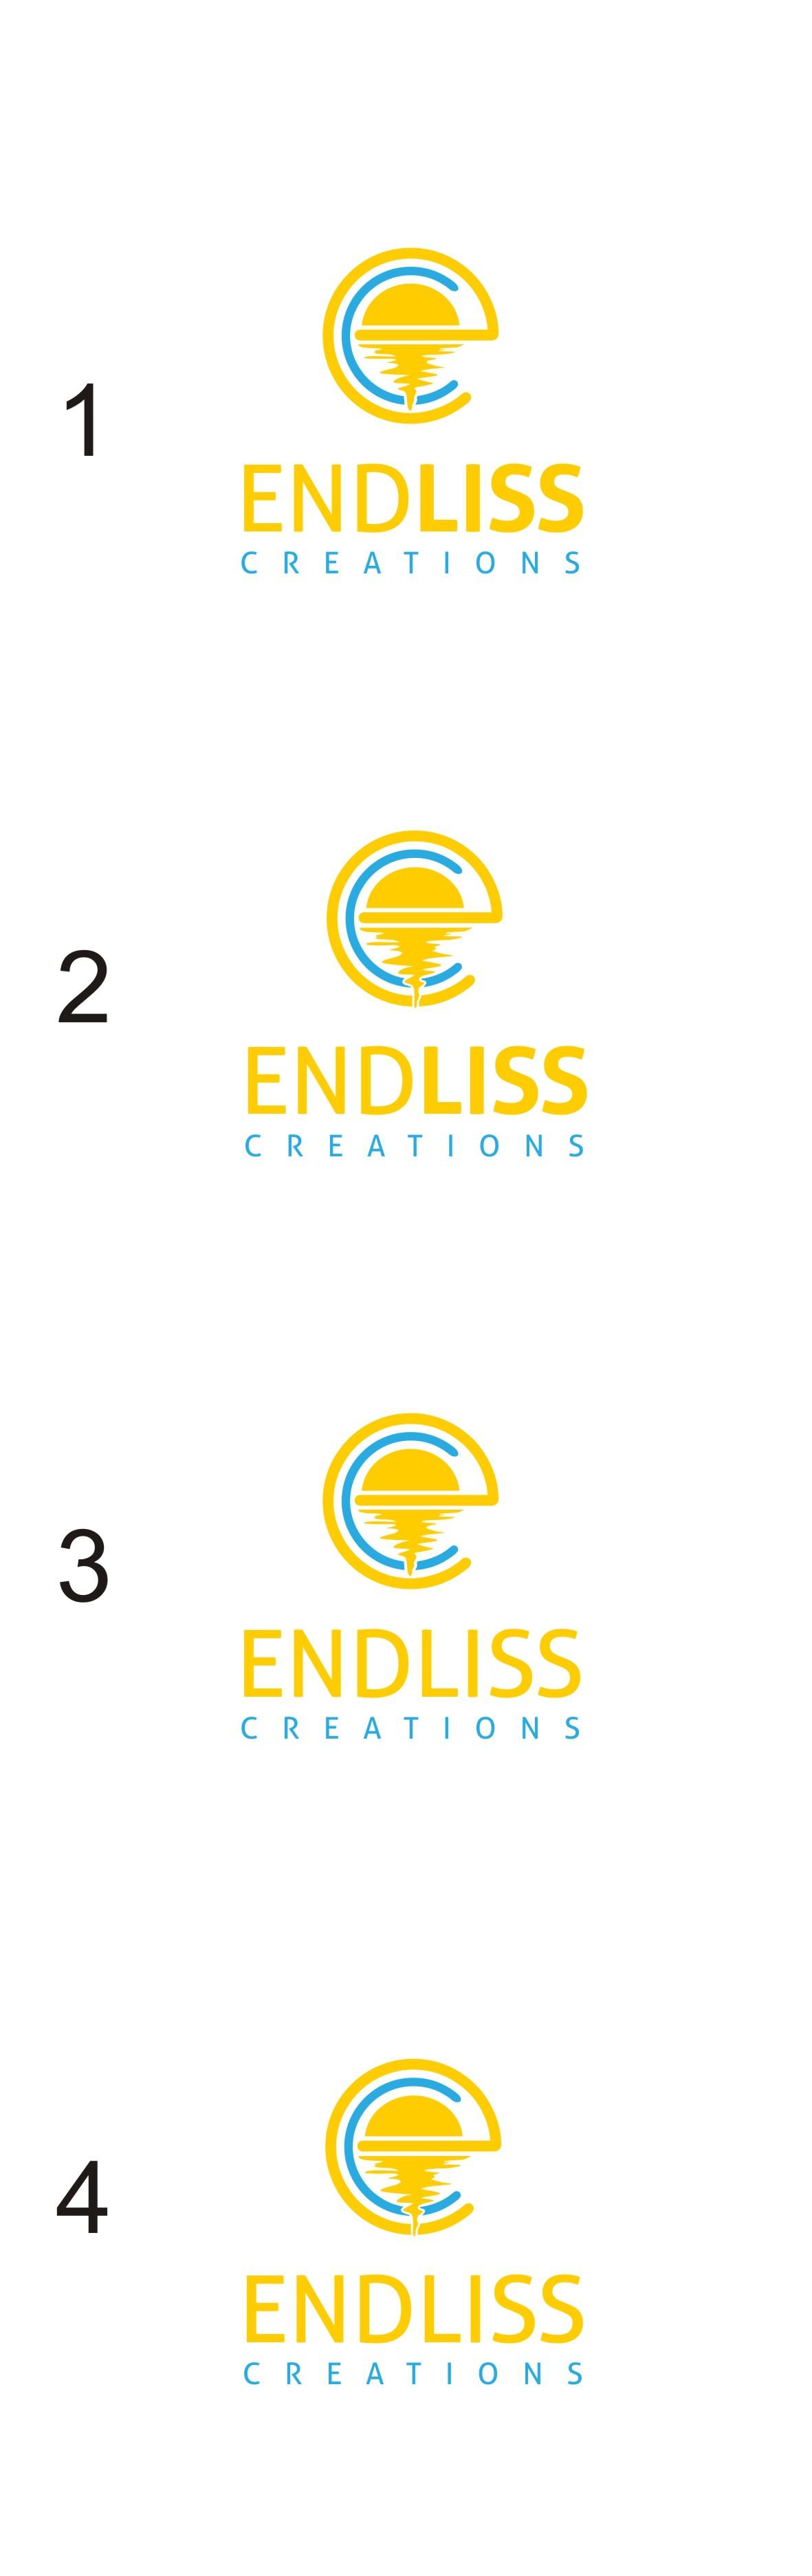 Endliss Creations Logo Design